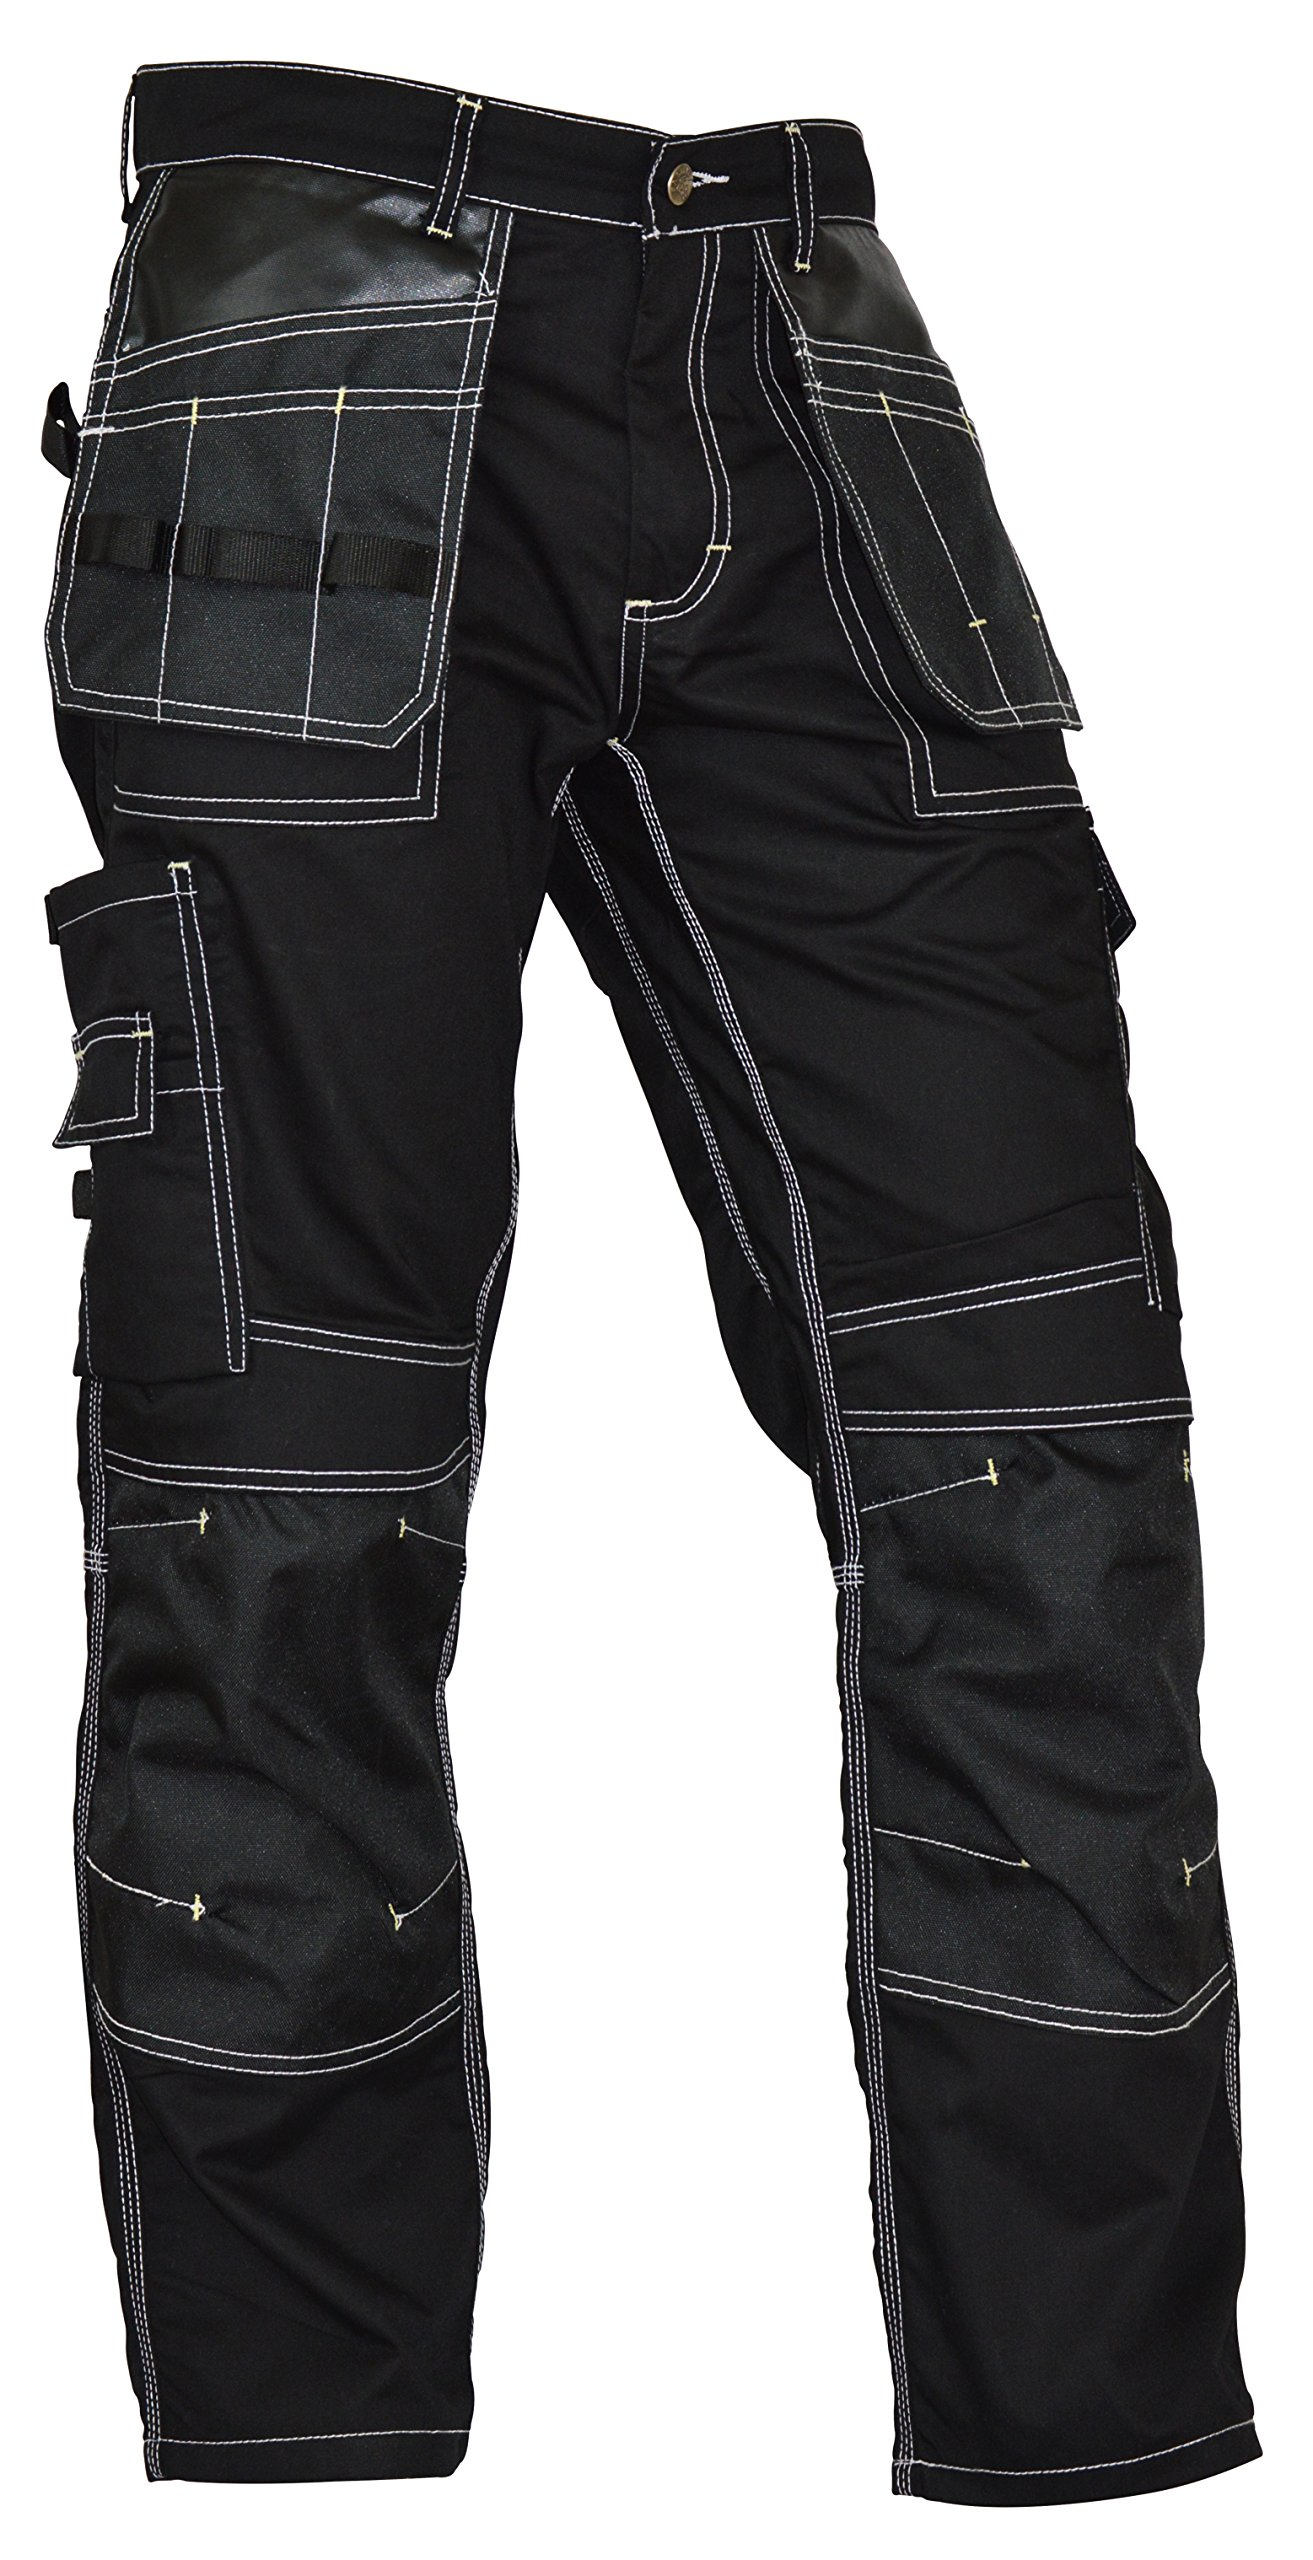 Fashio Mens Utility Workwear Pants Cordura Knee Reinforcement Trousers Black W36-L32